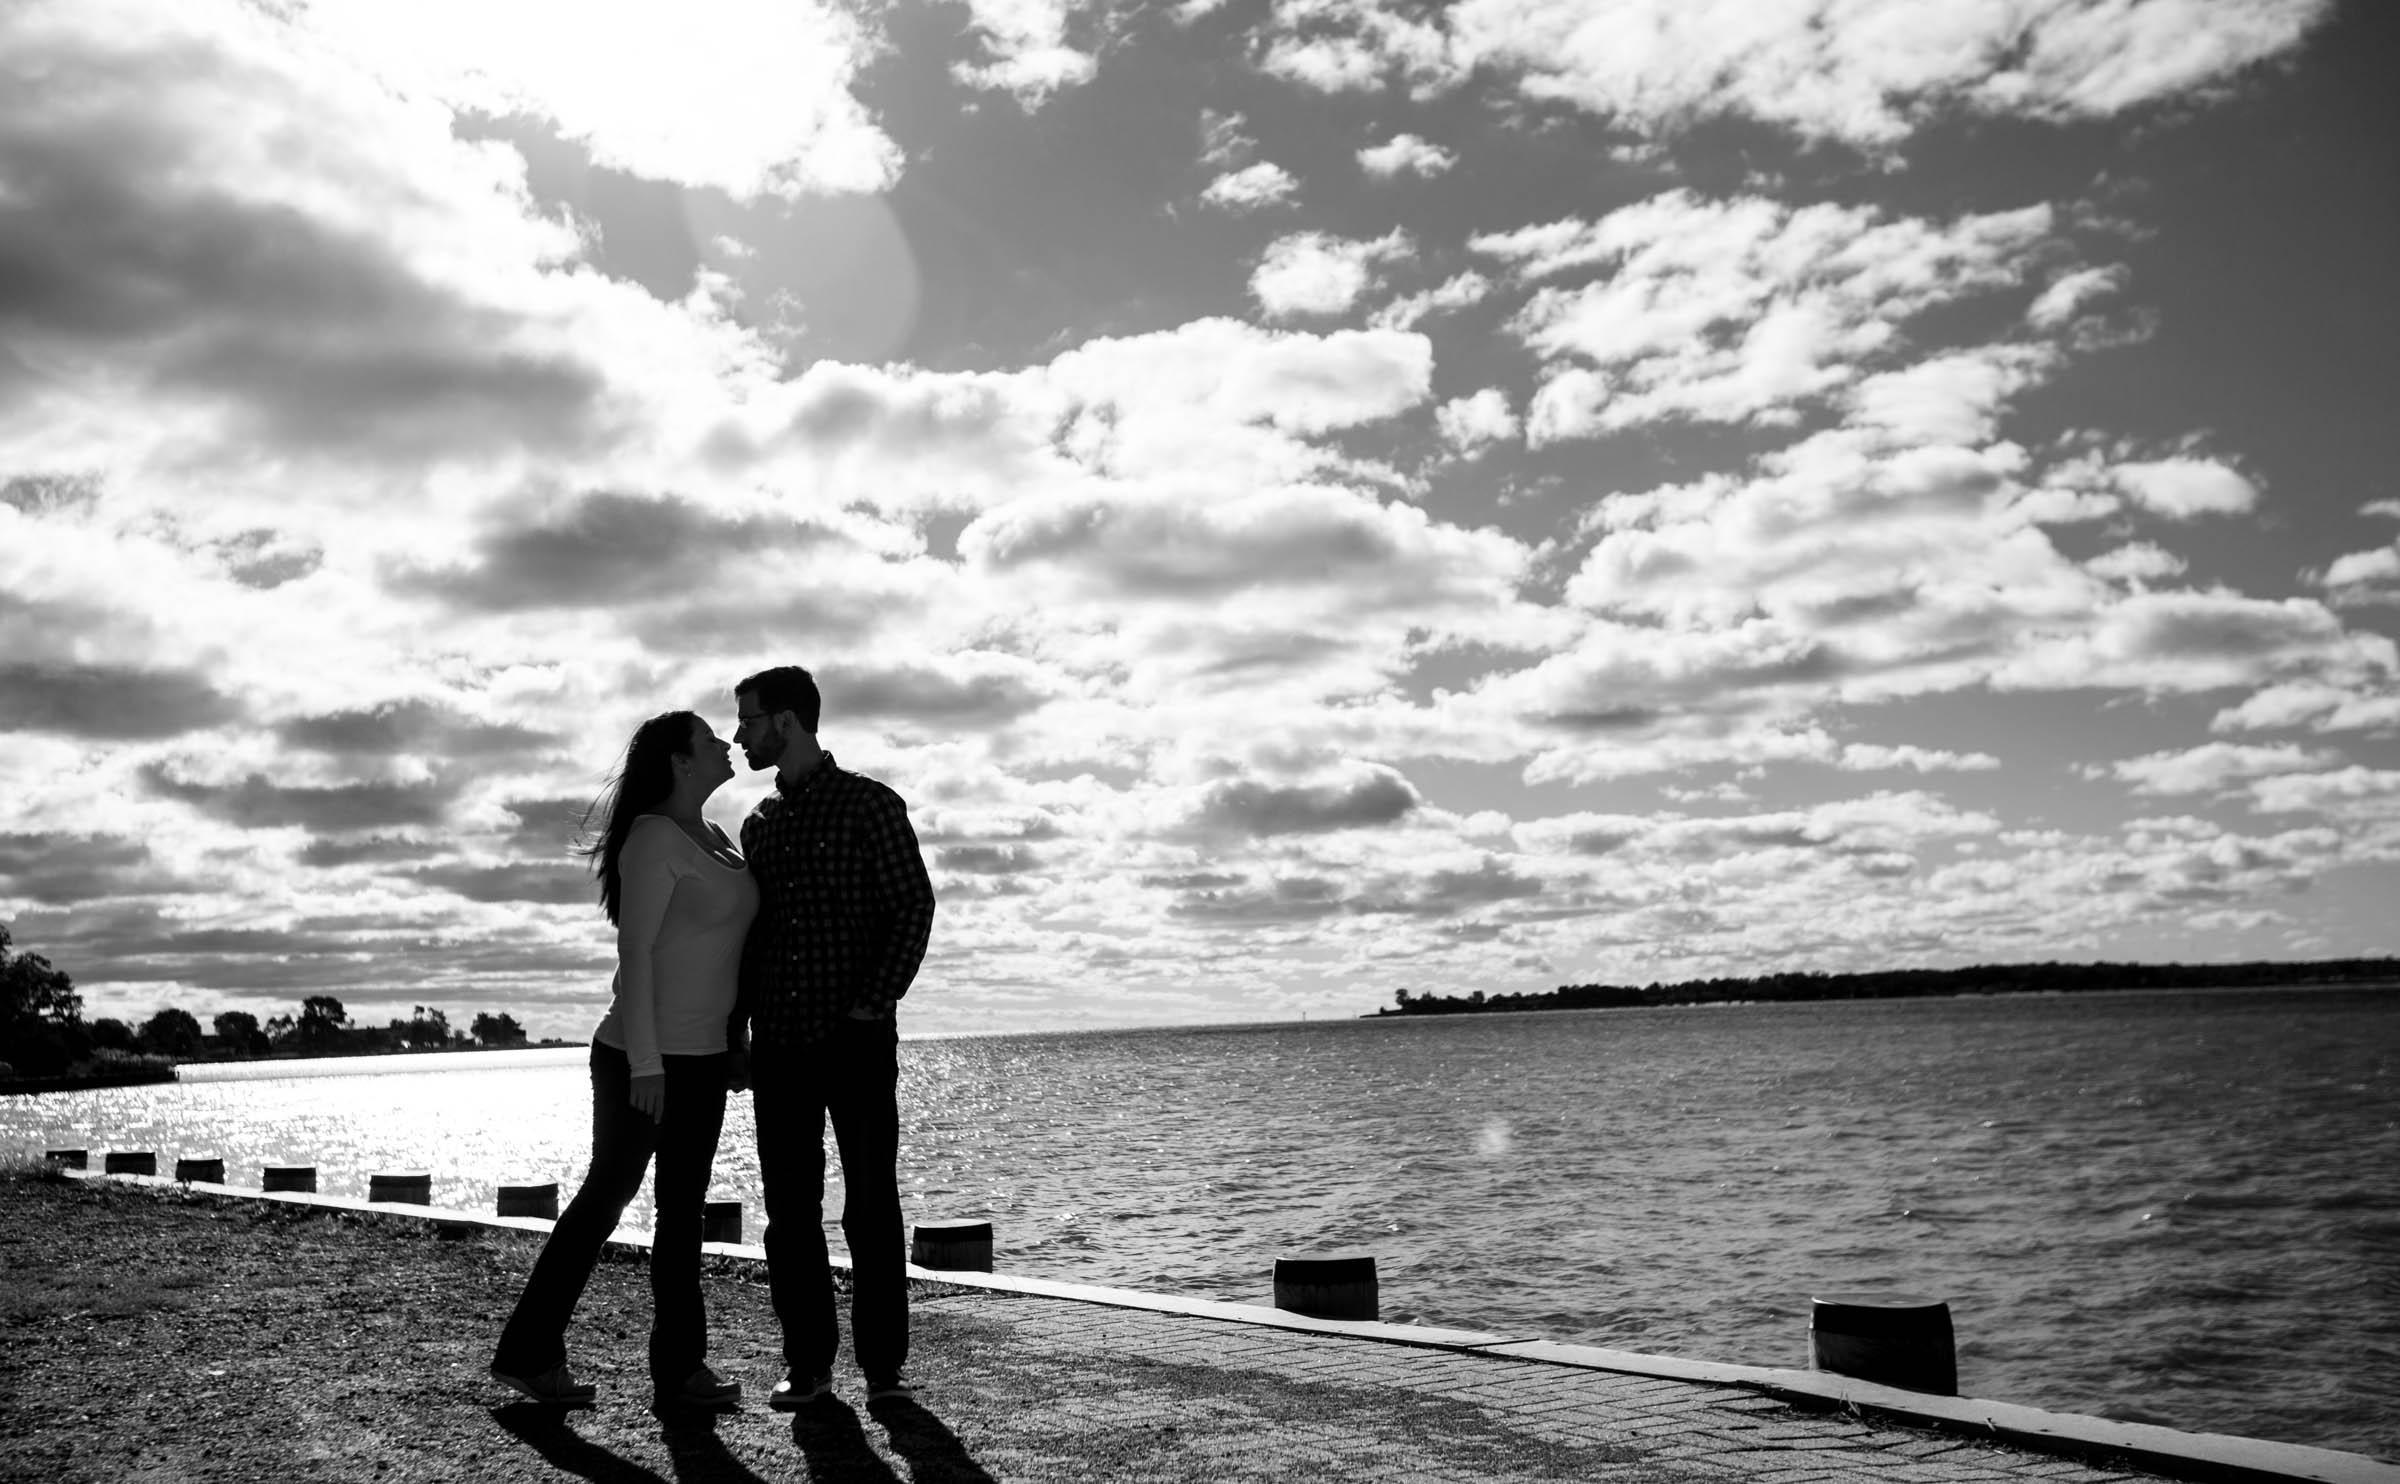 Annapolis Elopement Engagement Photography Megapixels Media Photography Maryland Photographer (22 of 22).jpg